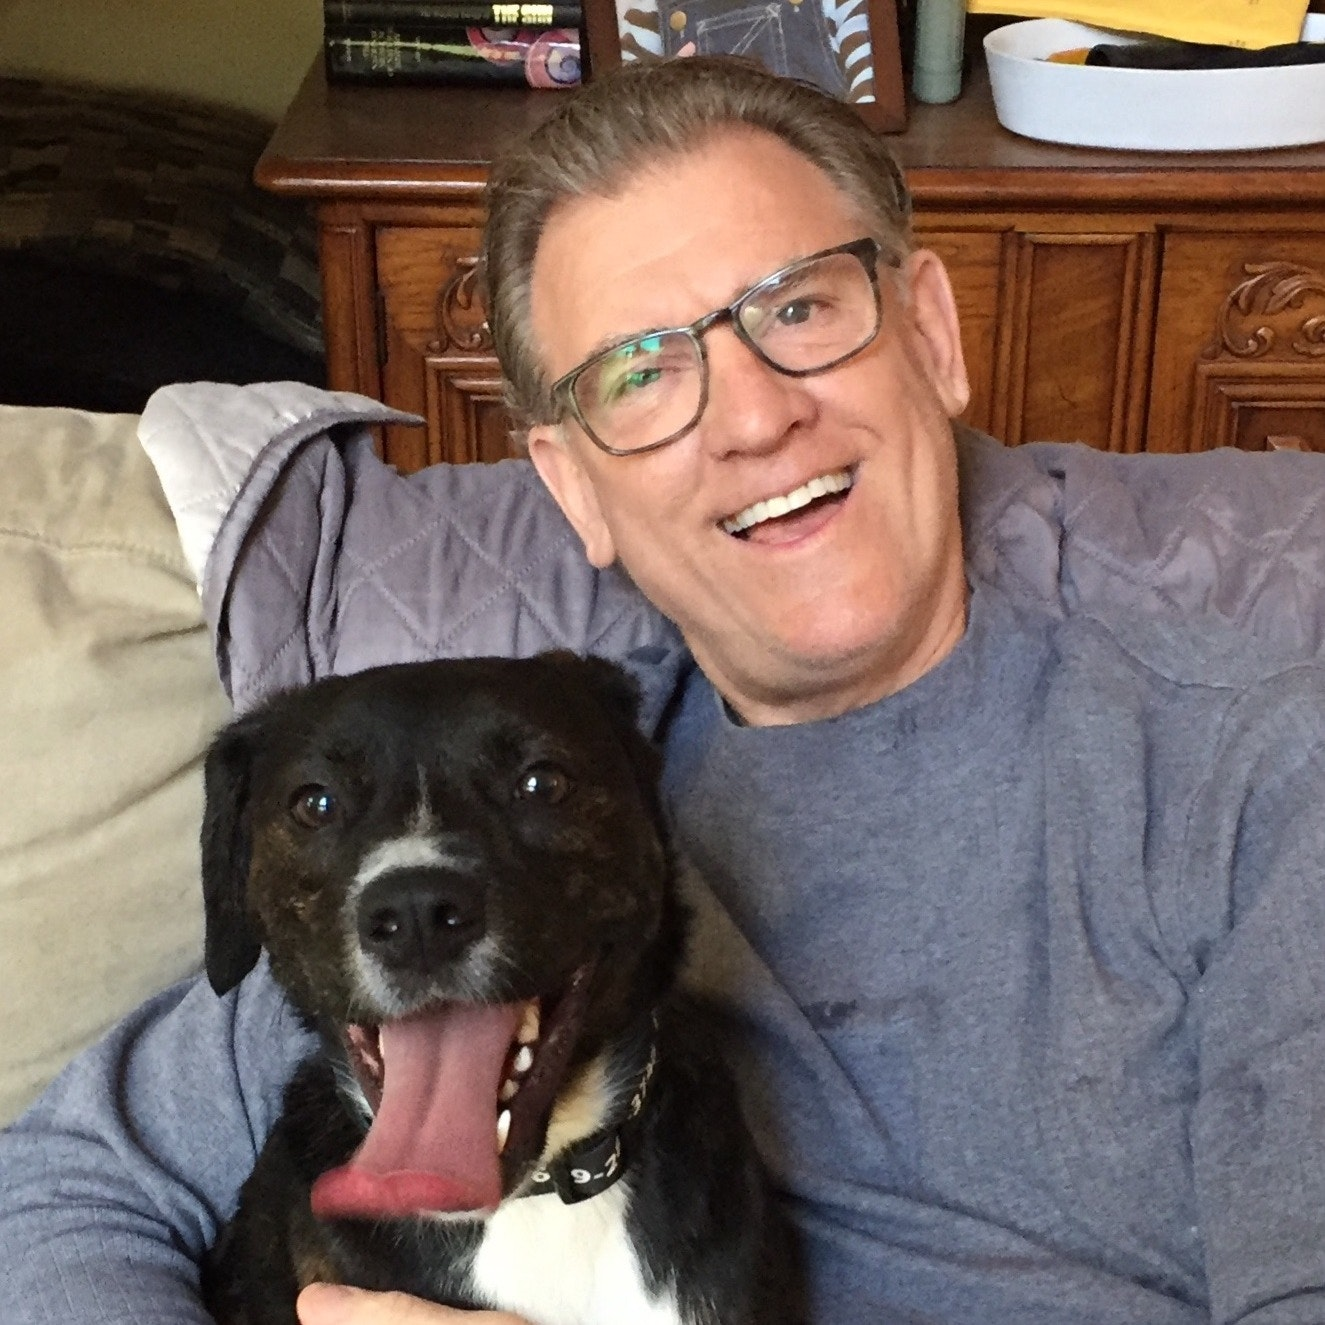 Dean's dog day care